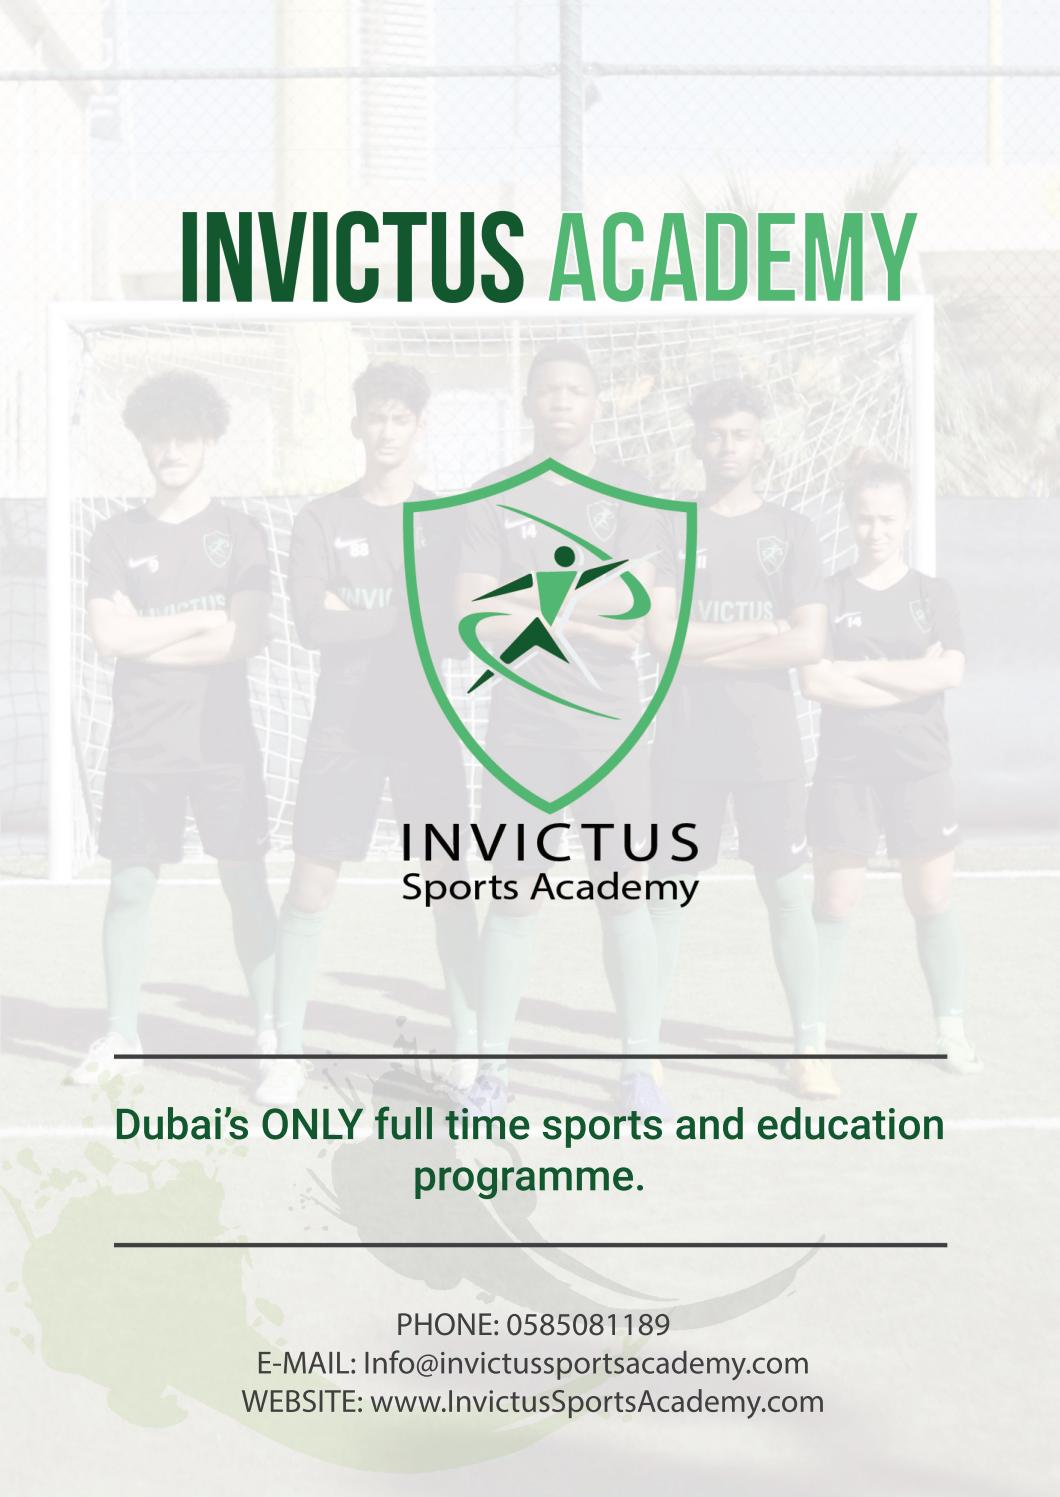 Invictus Academy Dubai Prospectus 2019/20 by Invictus Elite